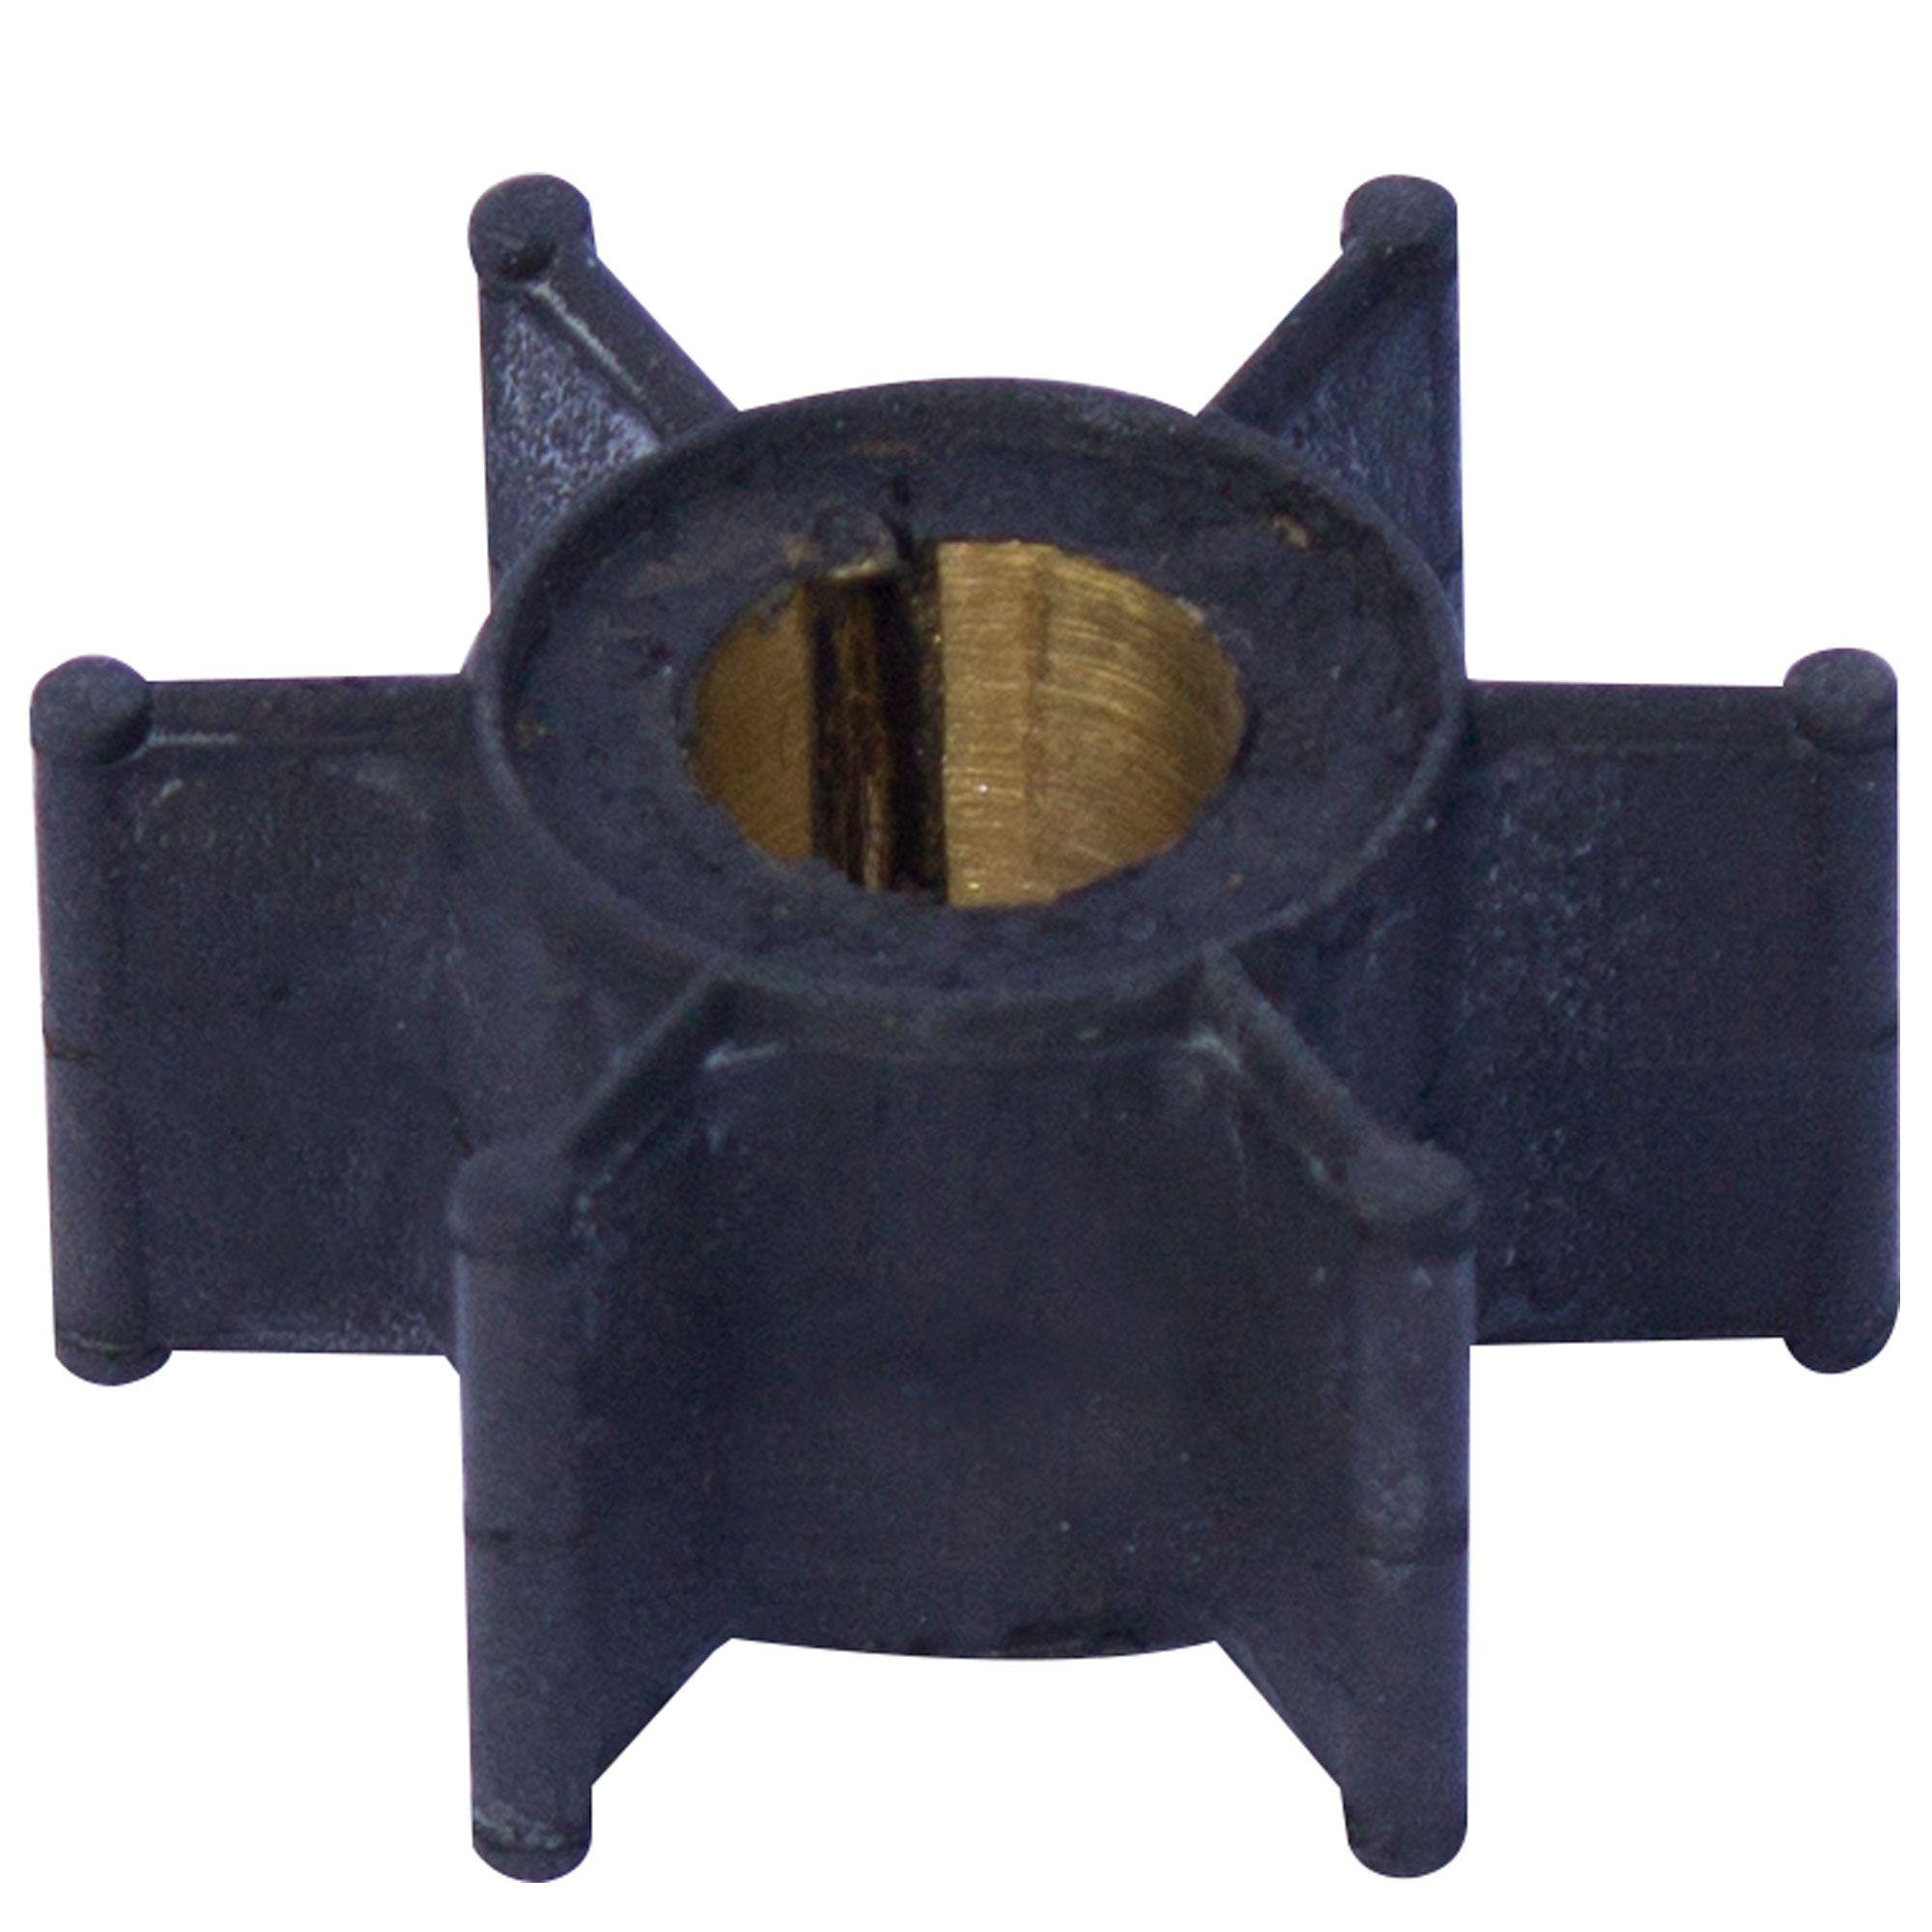 Rotor 43 x 15/32